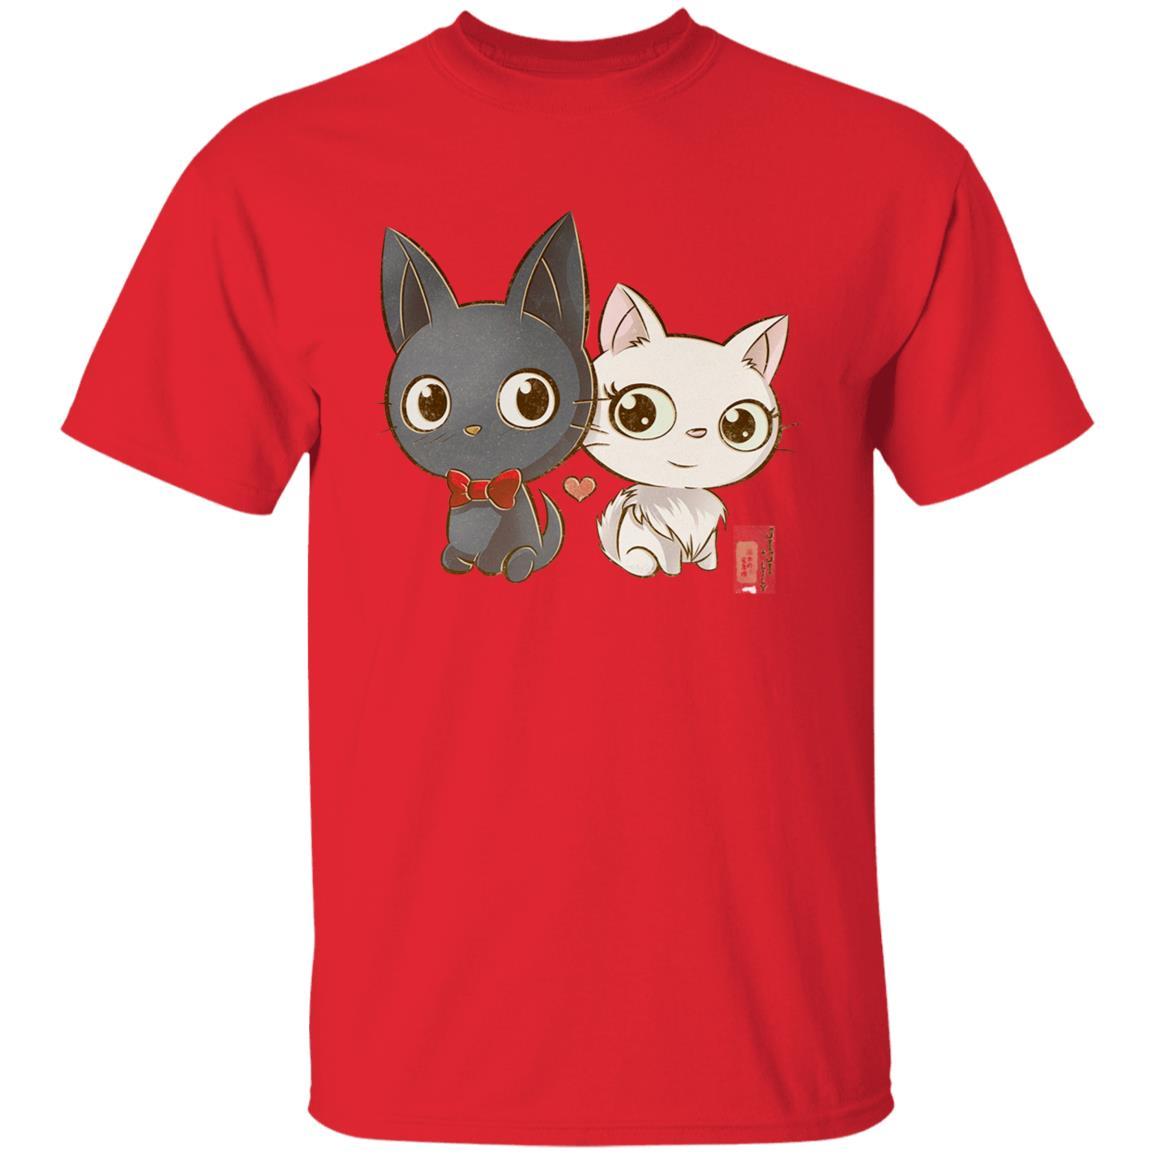 Kiki's Delivery Service – Jiji and Lily Chibi T Shirt